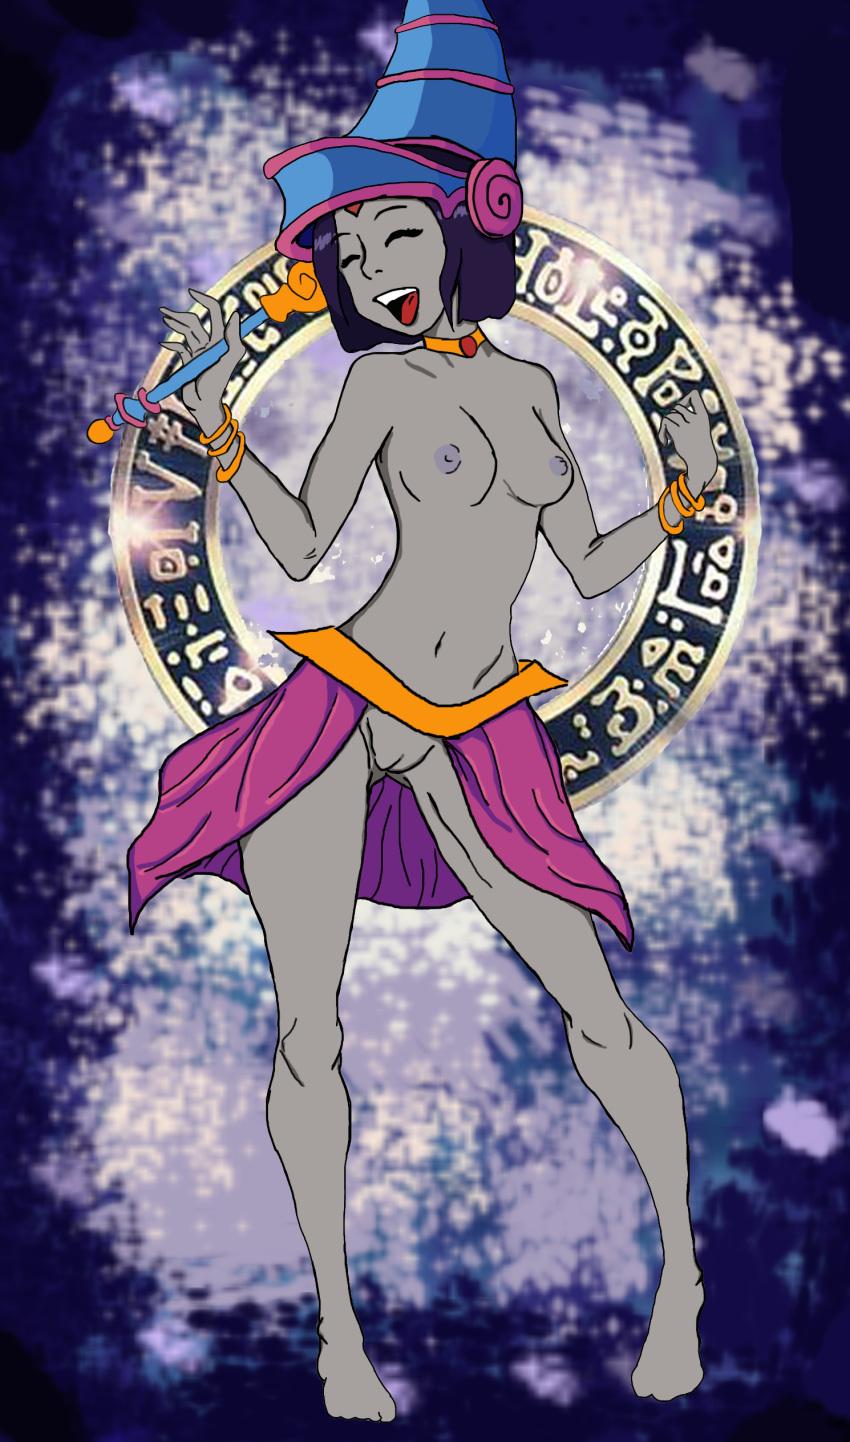 magician dark of chaos cosplay Furyou_ni_hamerarete_jusei_suru_kyonyuu_okaa-san_the_animation